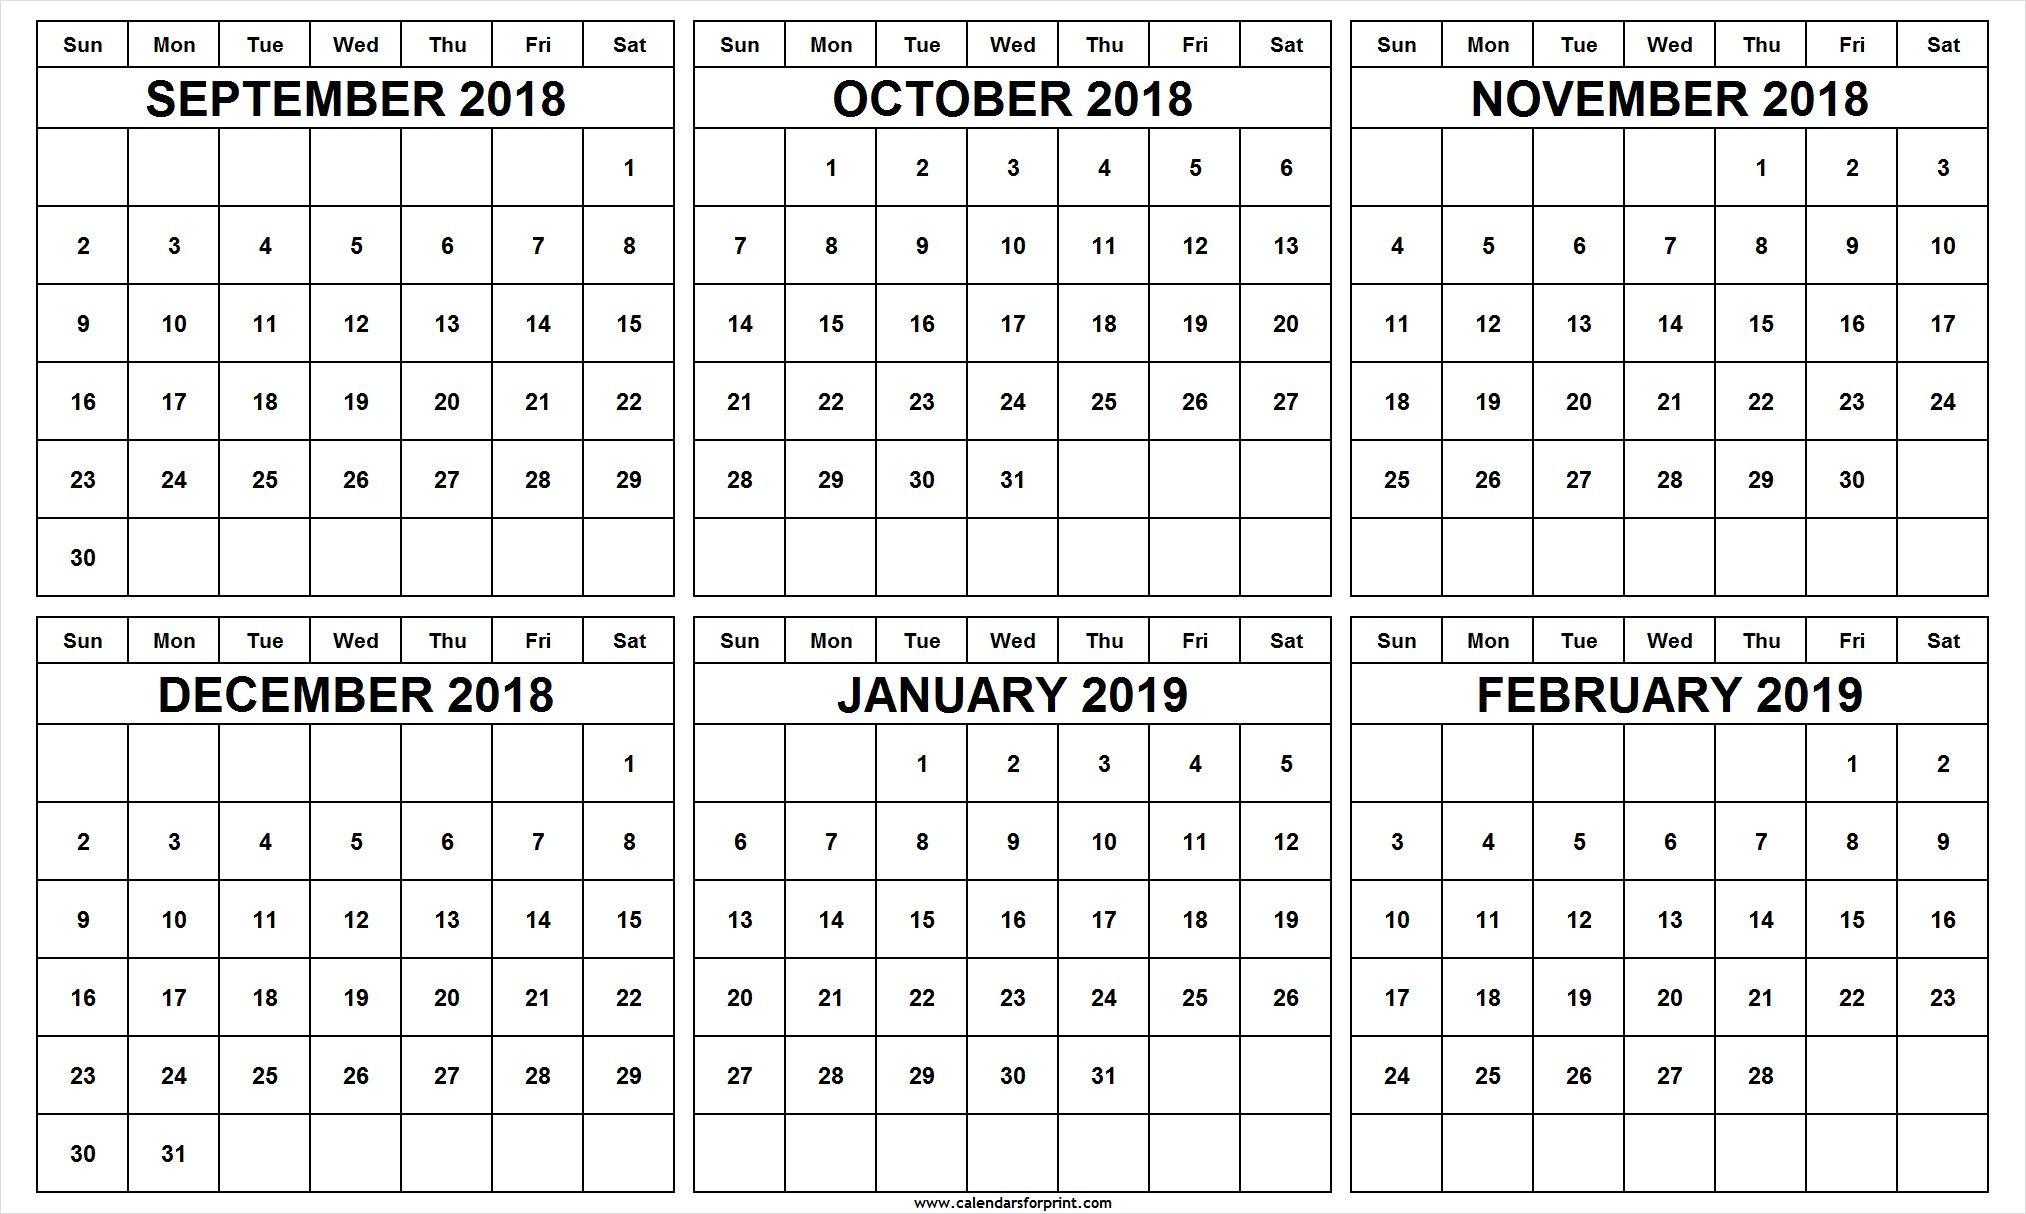 Free Printable Calendars September-December 2019 6 Month Calendar September October November December 2018 January